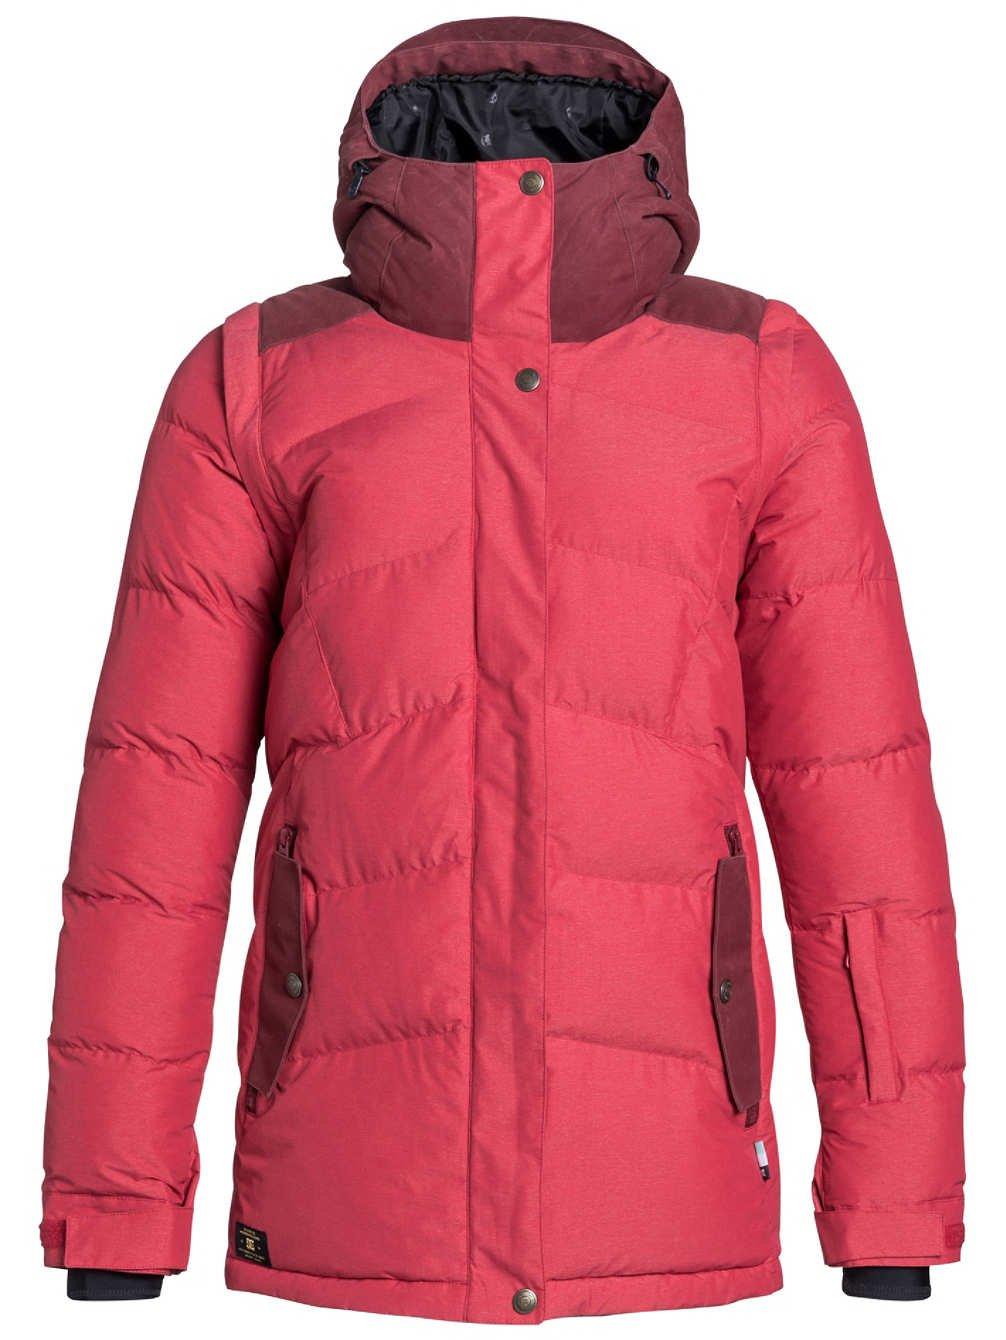 Damen Snowboard Jacke DC Liberty Jacket online kaufen